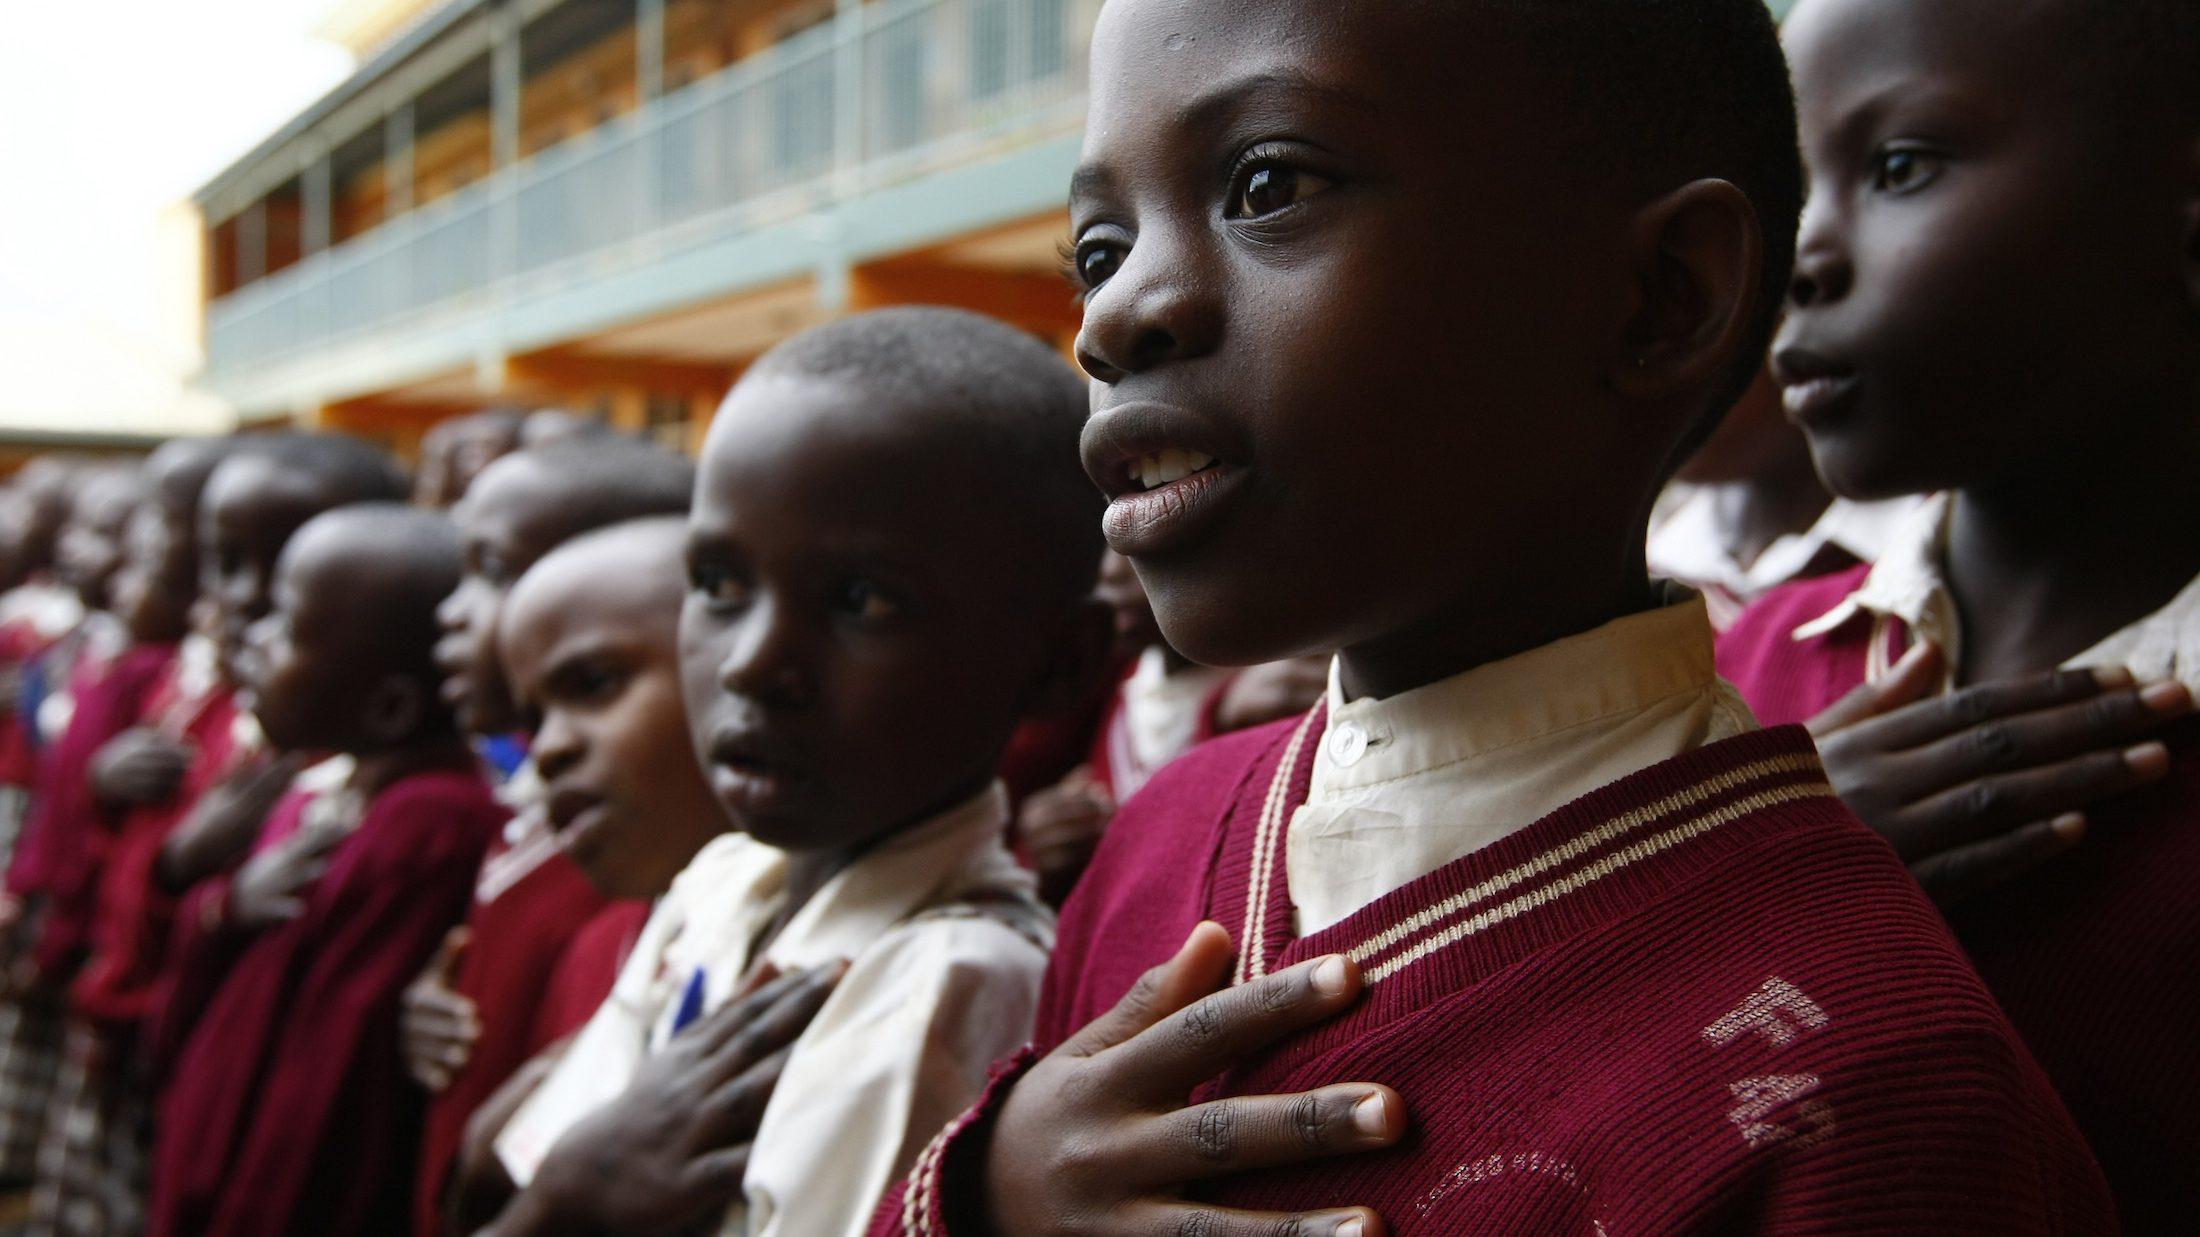 Students sing during morning assembly at Kyamusansala Primary School in Masaka